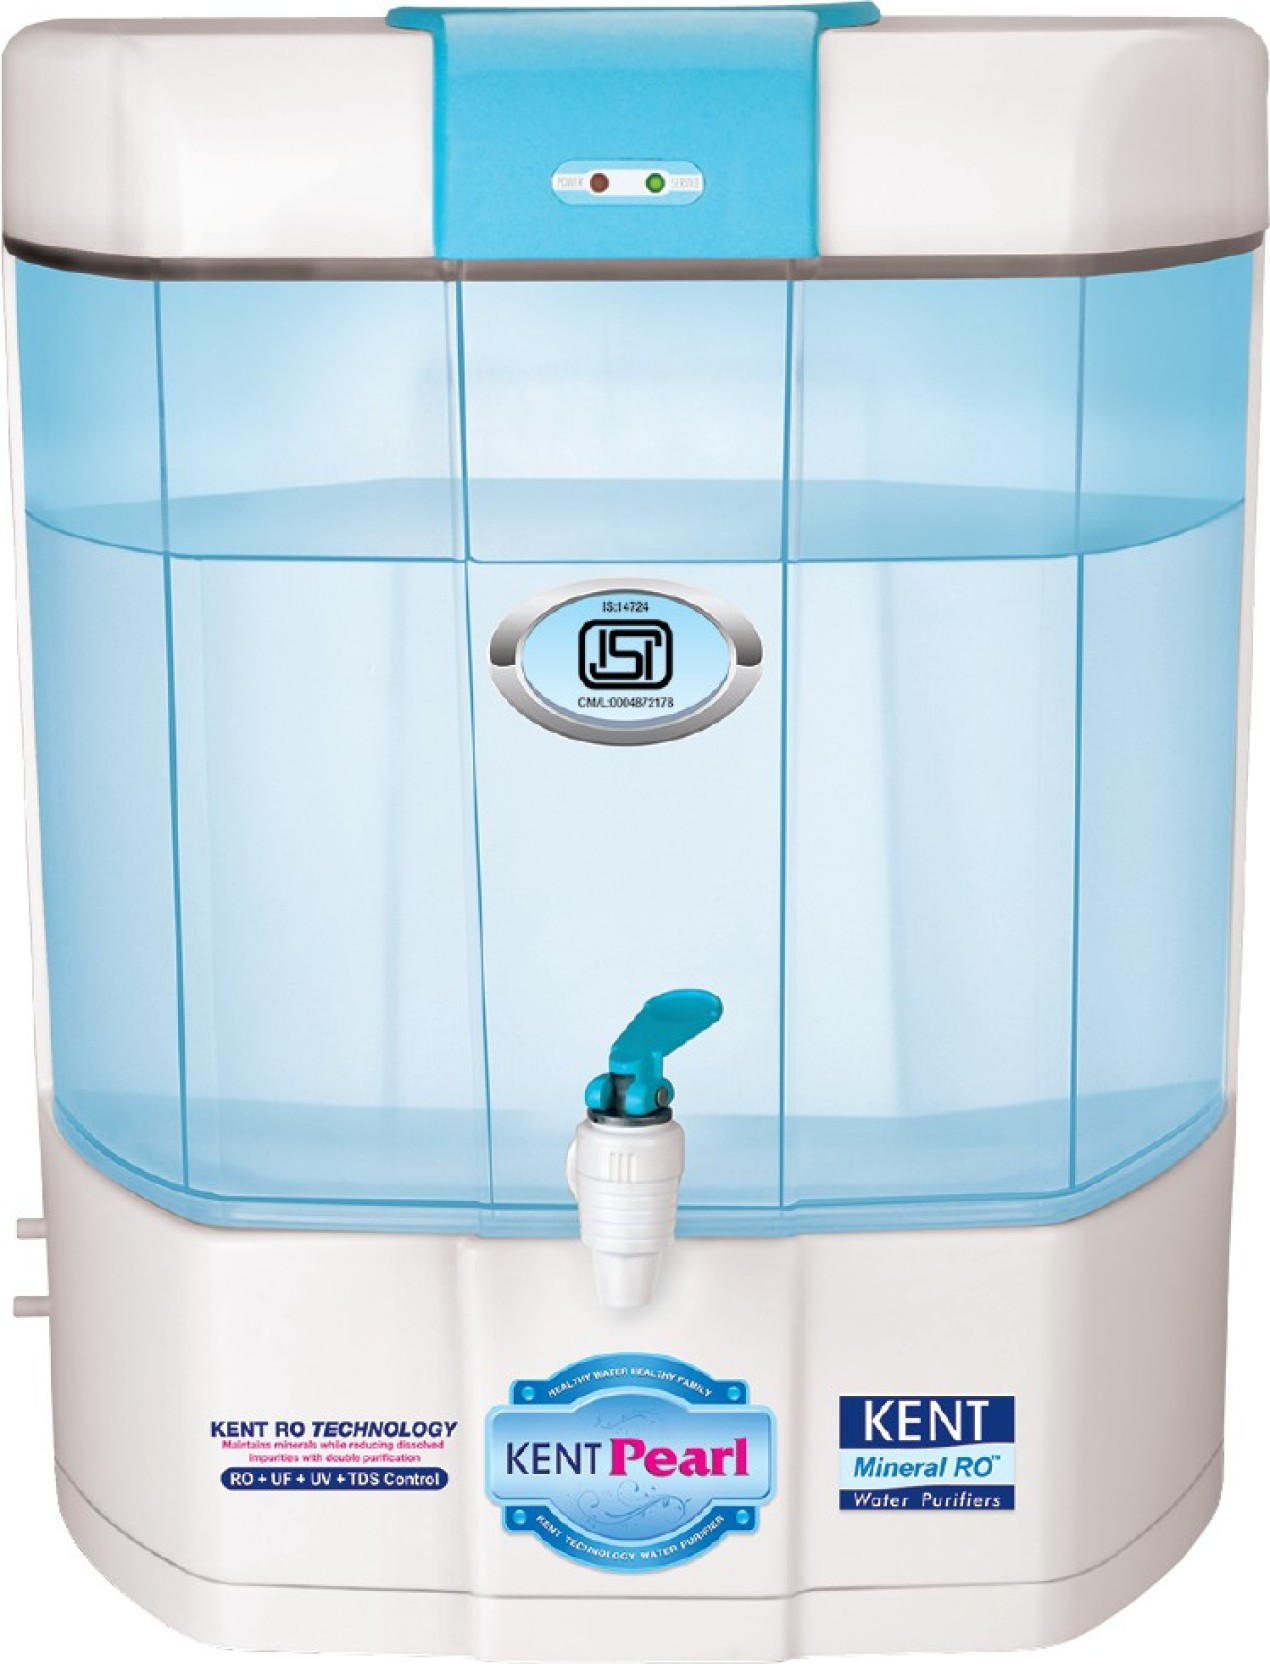 Kent Pearl Mineral Ro 8 L Ro Uv Uf Water Purifier